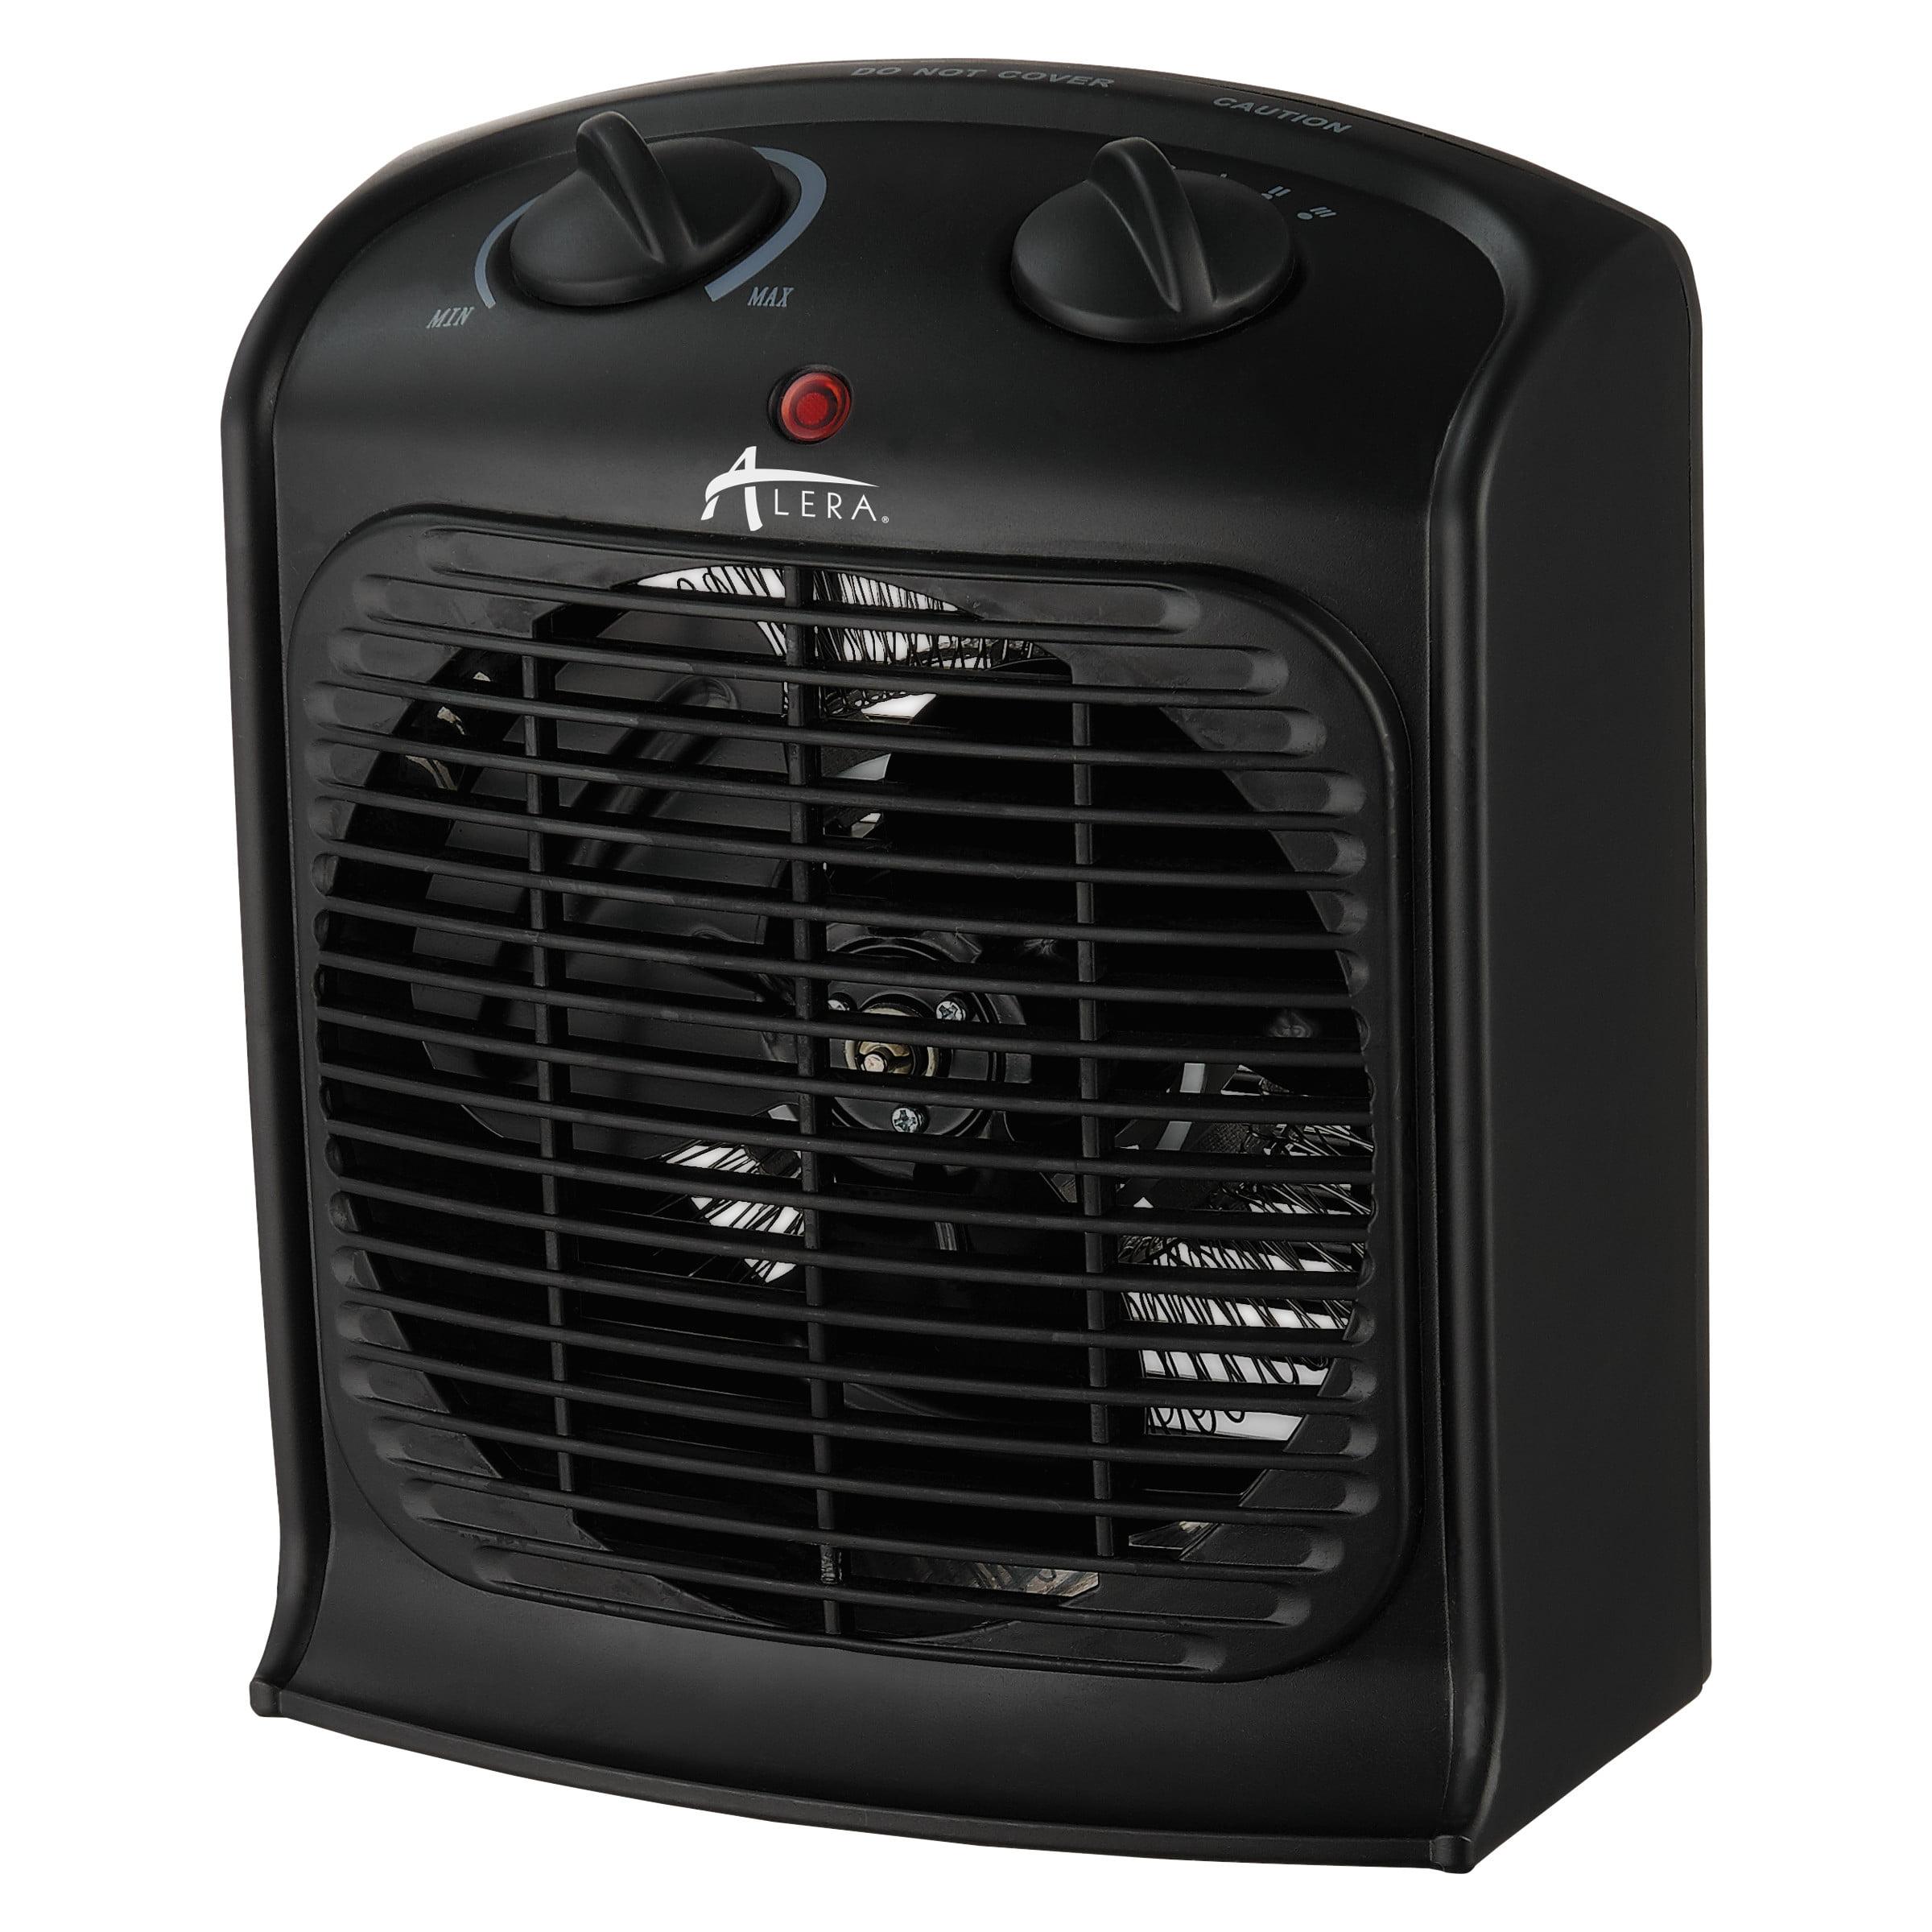 "Alera Heater Fan, 8 1/4""w x 4 3/4""d x 9 3/4""h, Black"